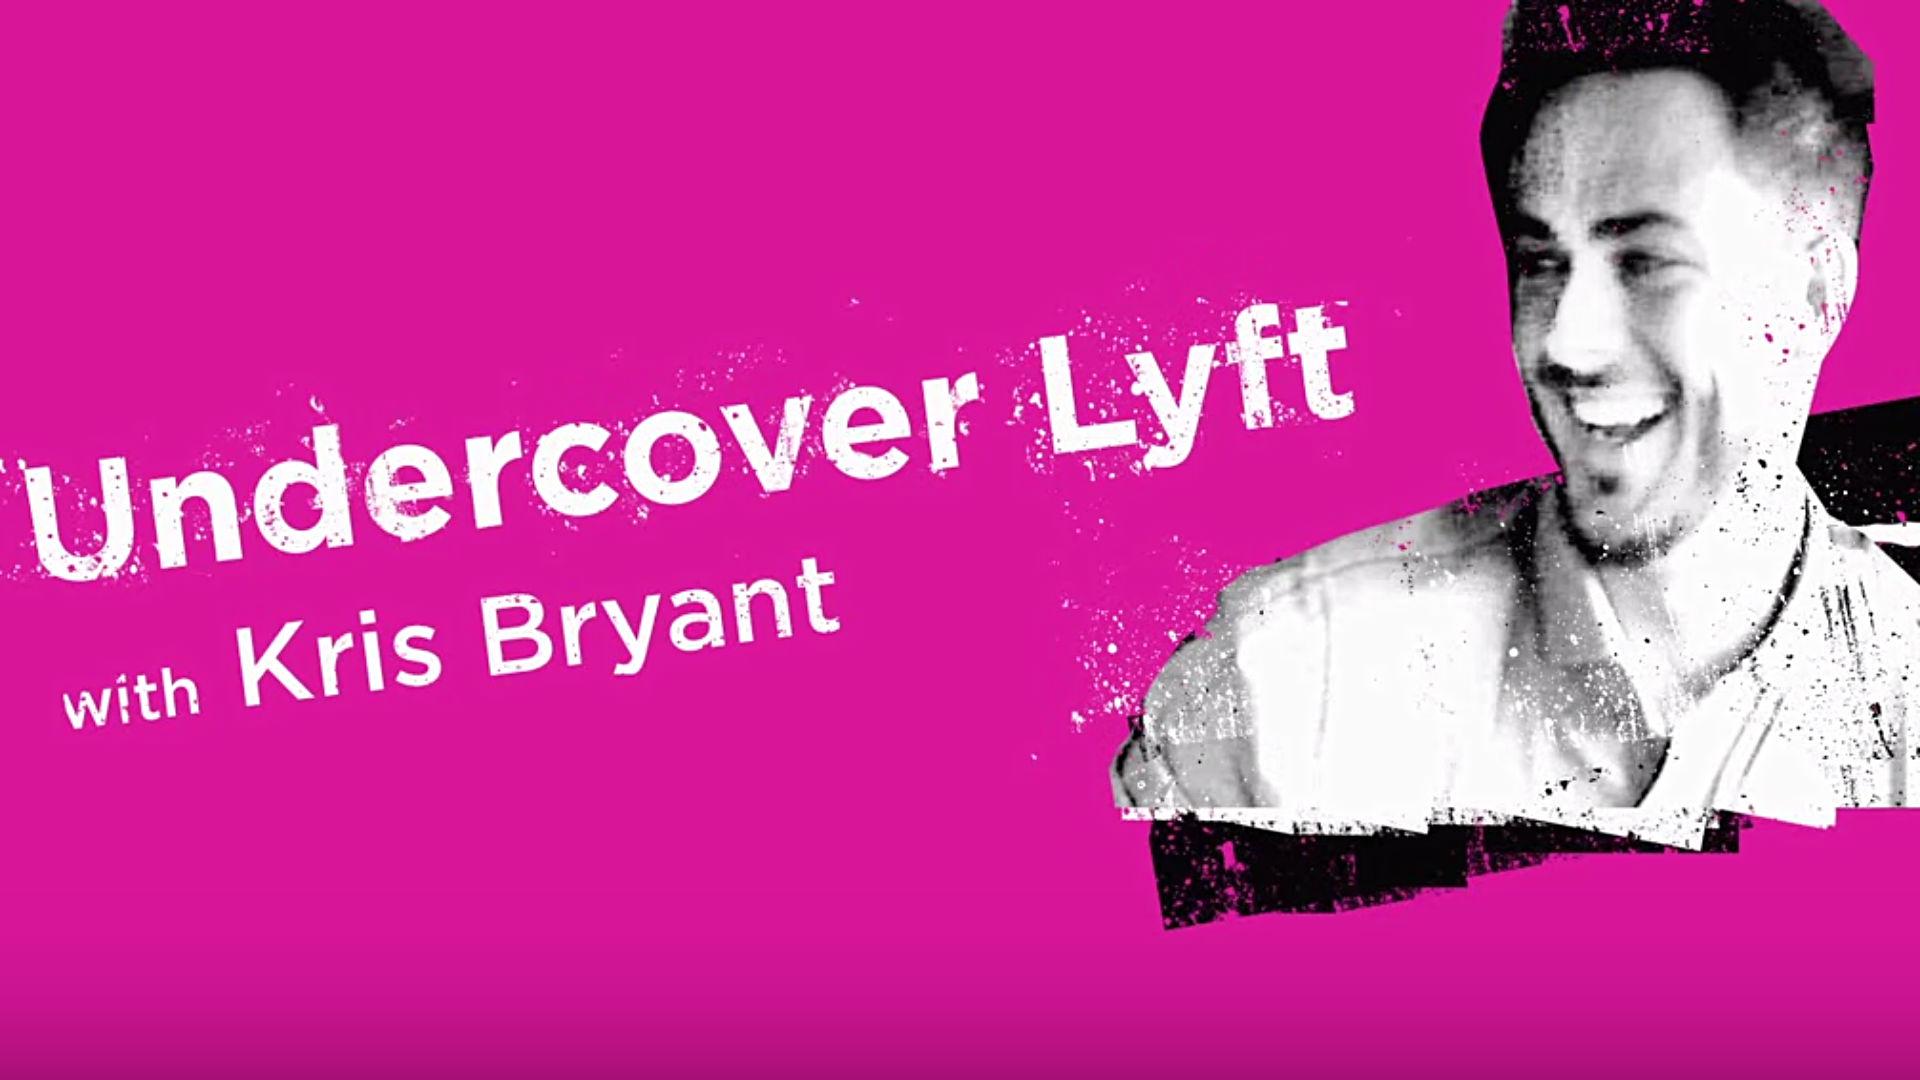 bryant-kris-091815-usnews-youtube-ftr